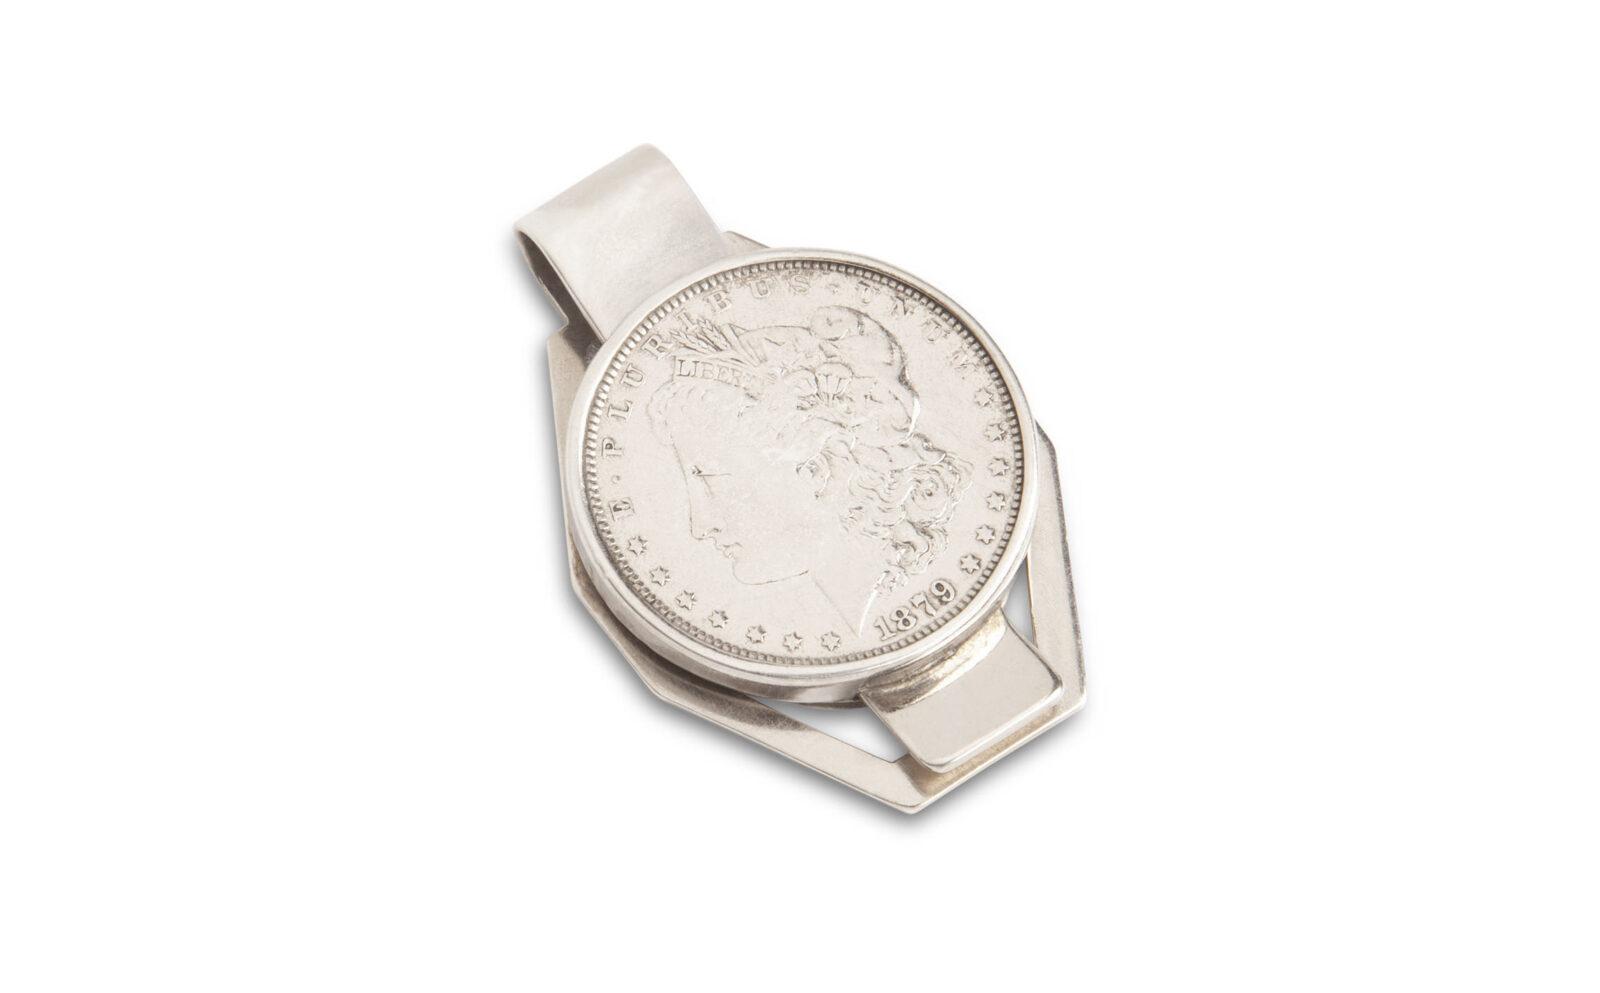 Sterling Silver Dollar Money Clip 1600x993 - Sterling Silver Dollar Money Clip